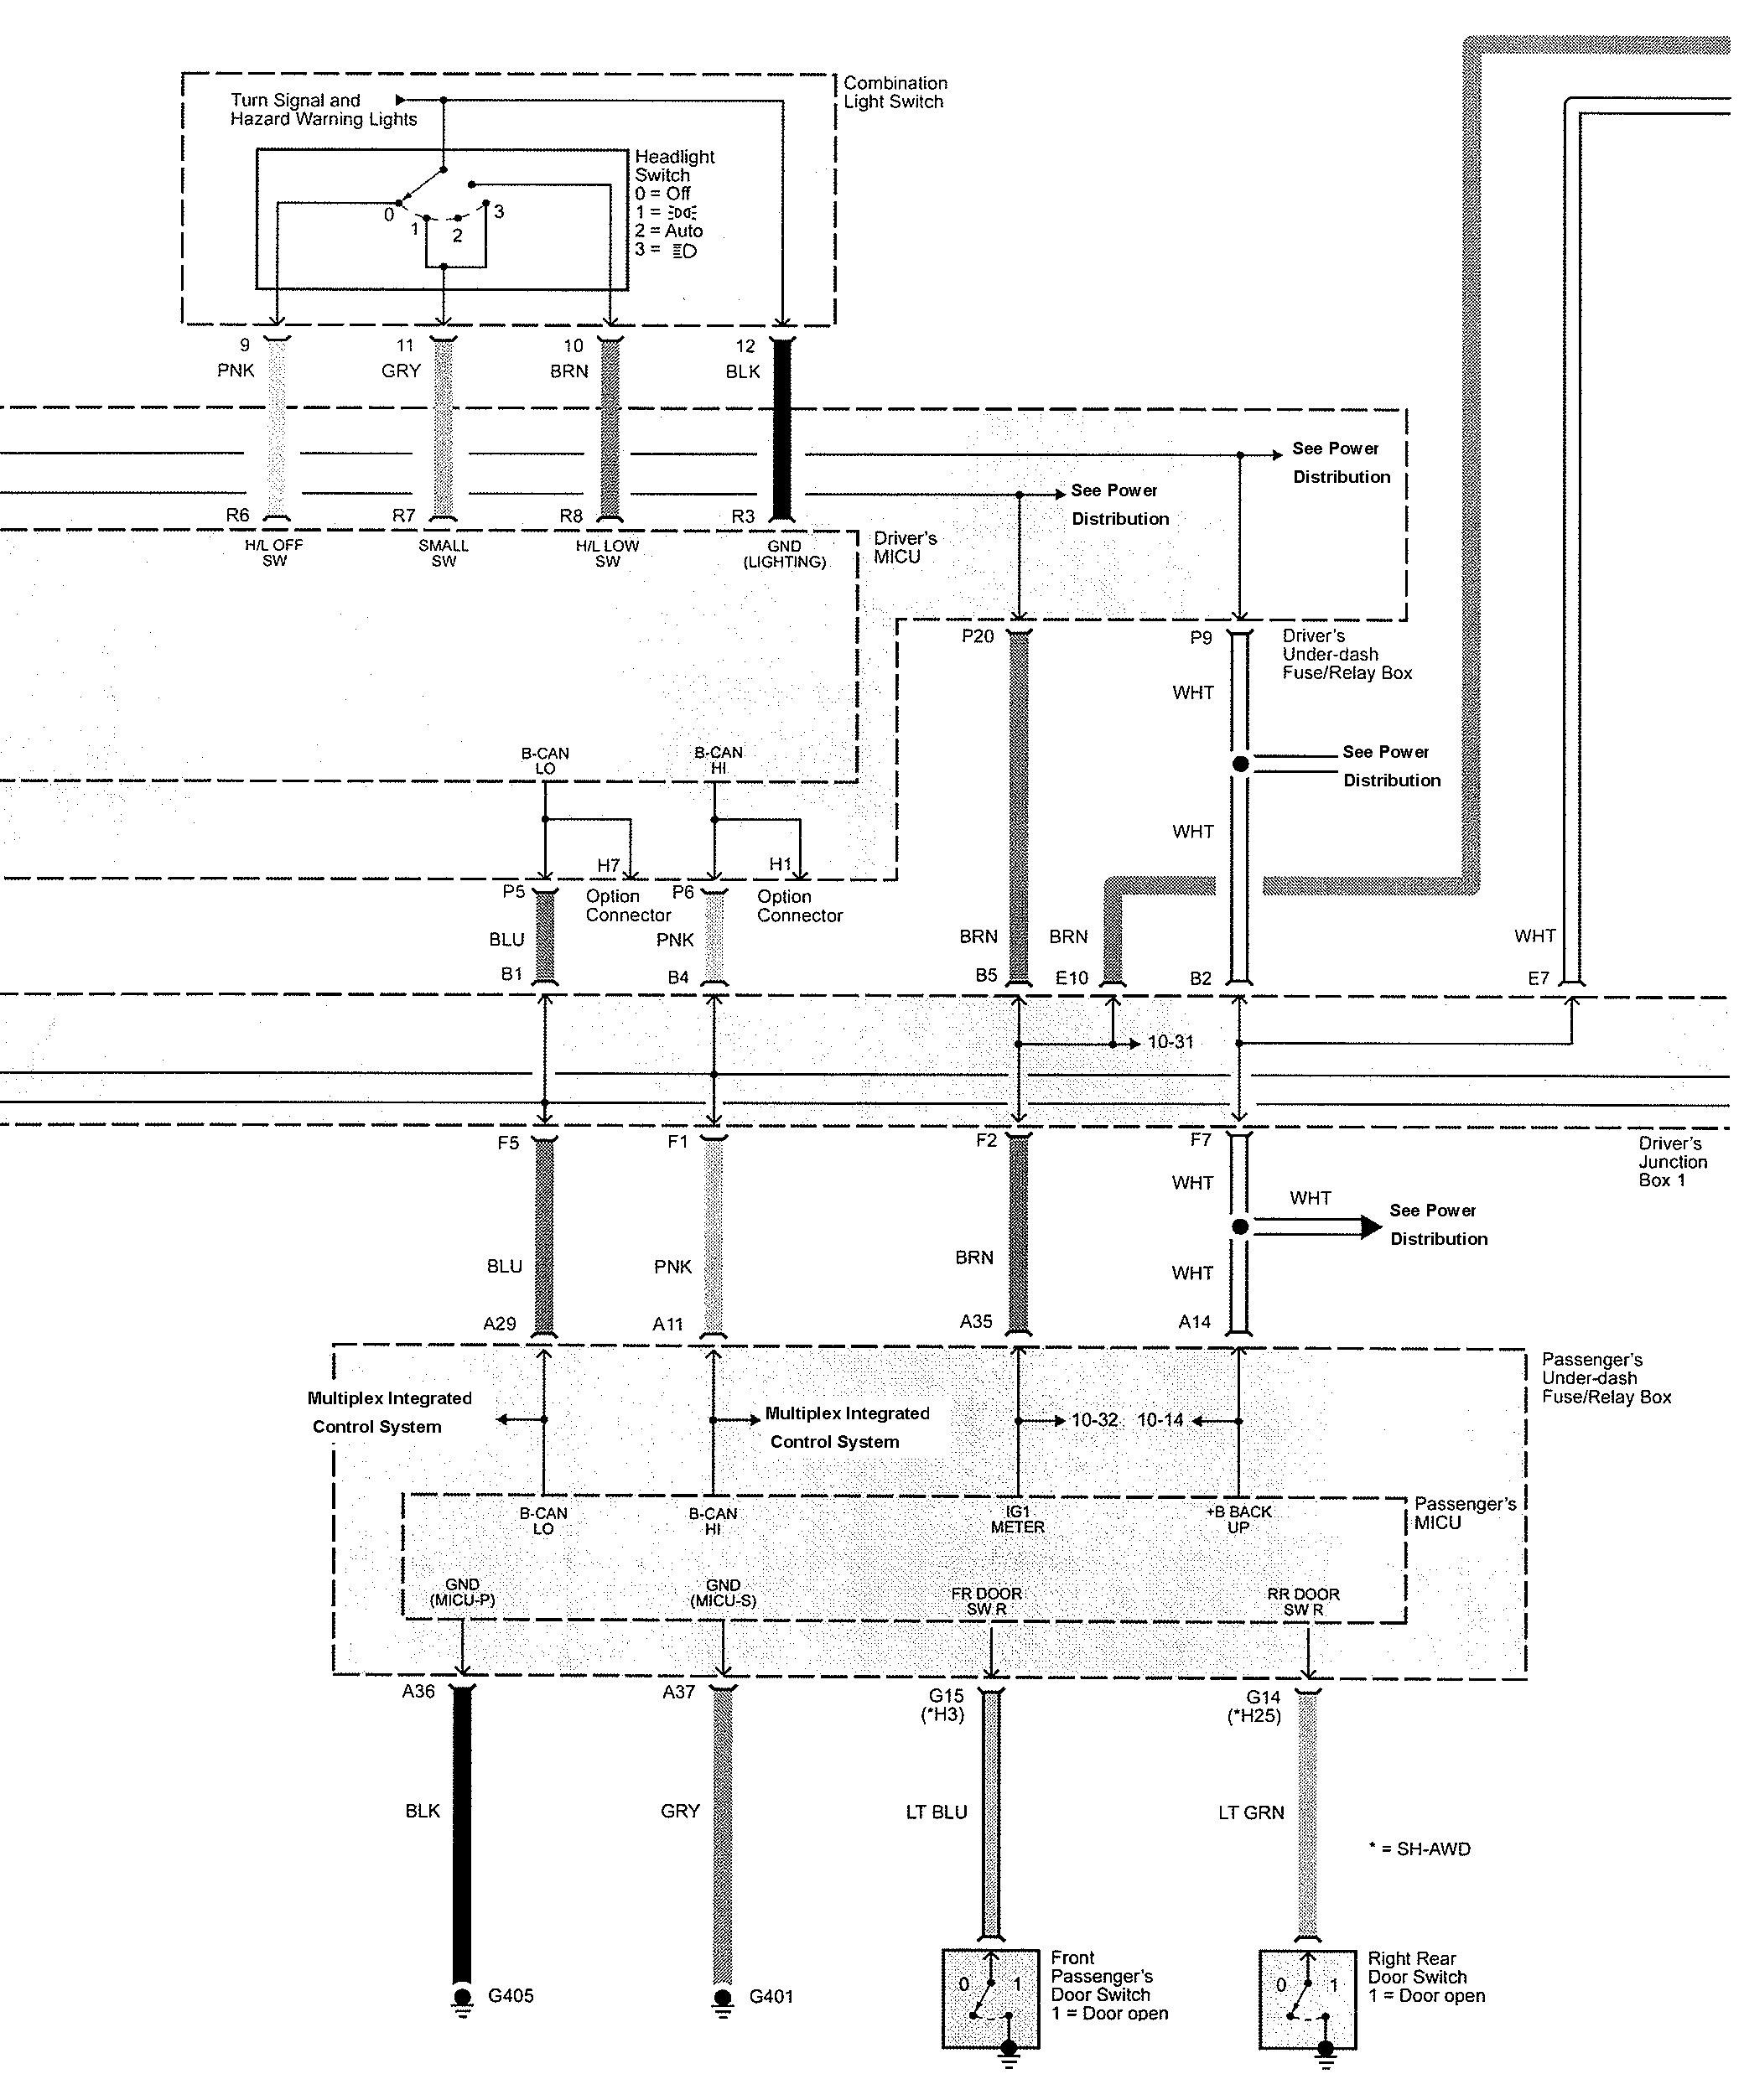 2006 Acura Tl Speaker Diagram Electrical Wiring Diagrams Stereo U2022 Aftermarket